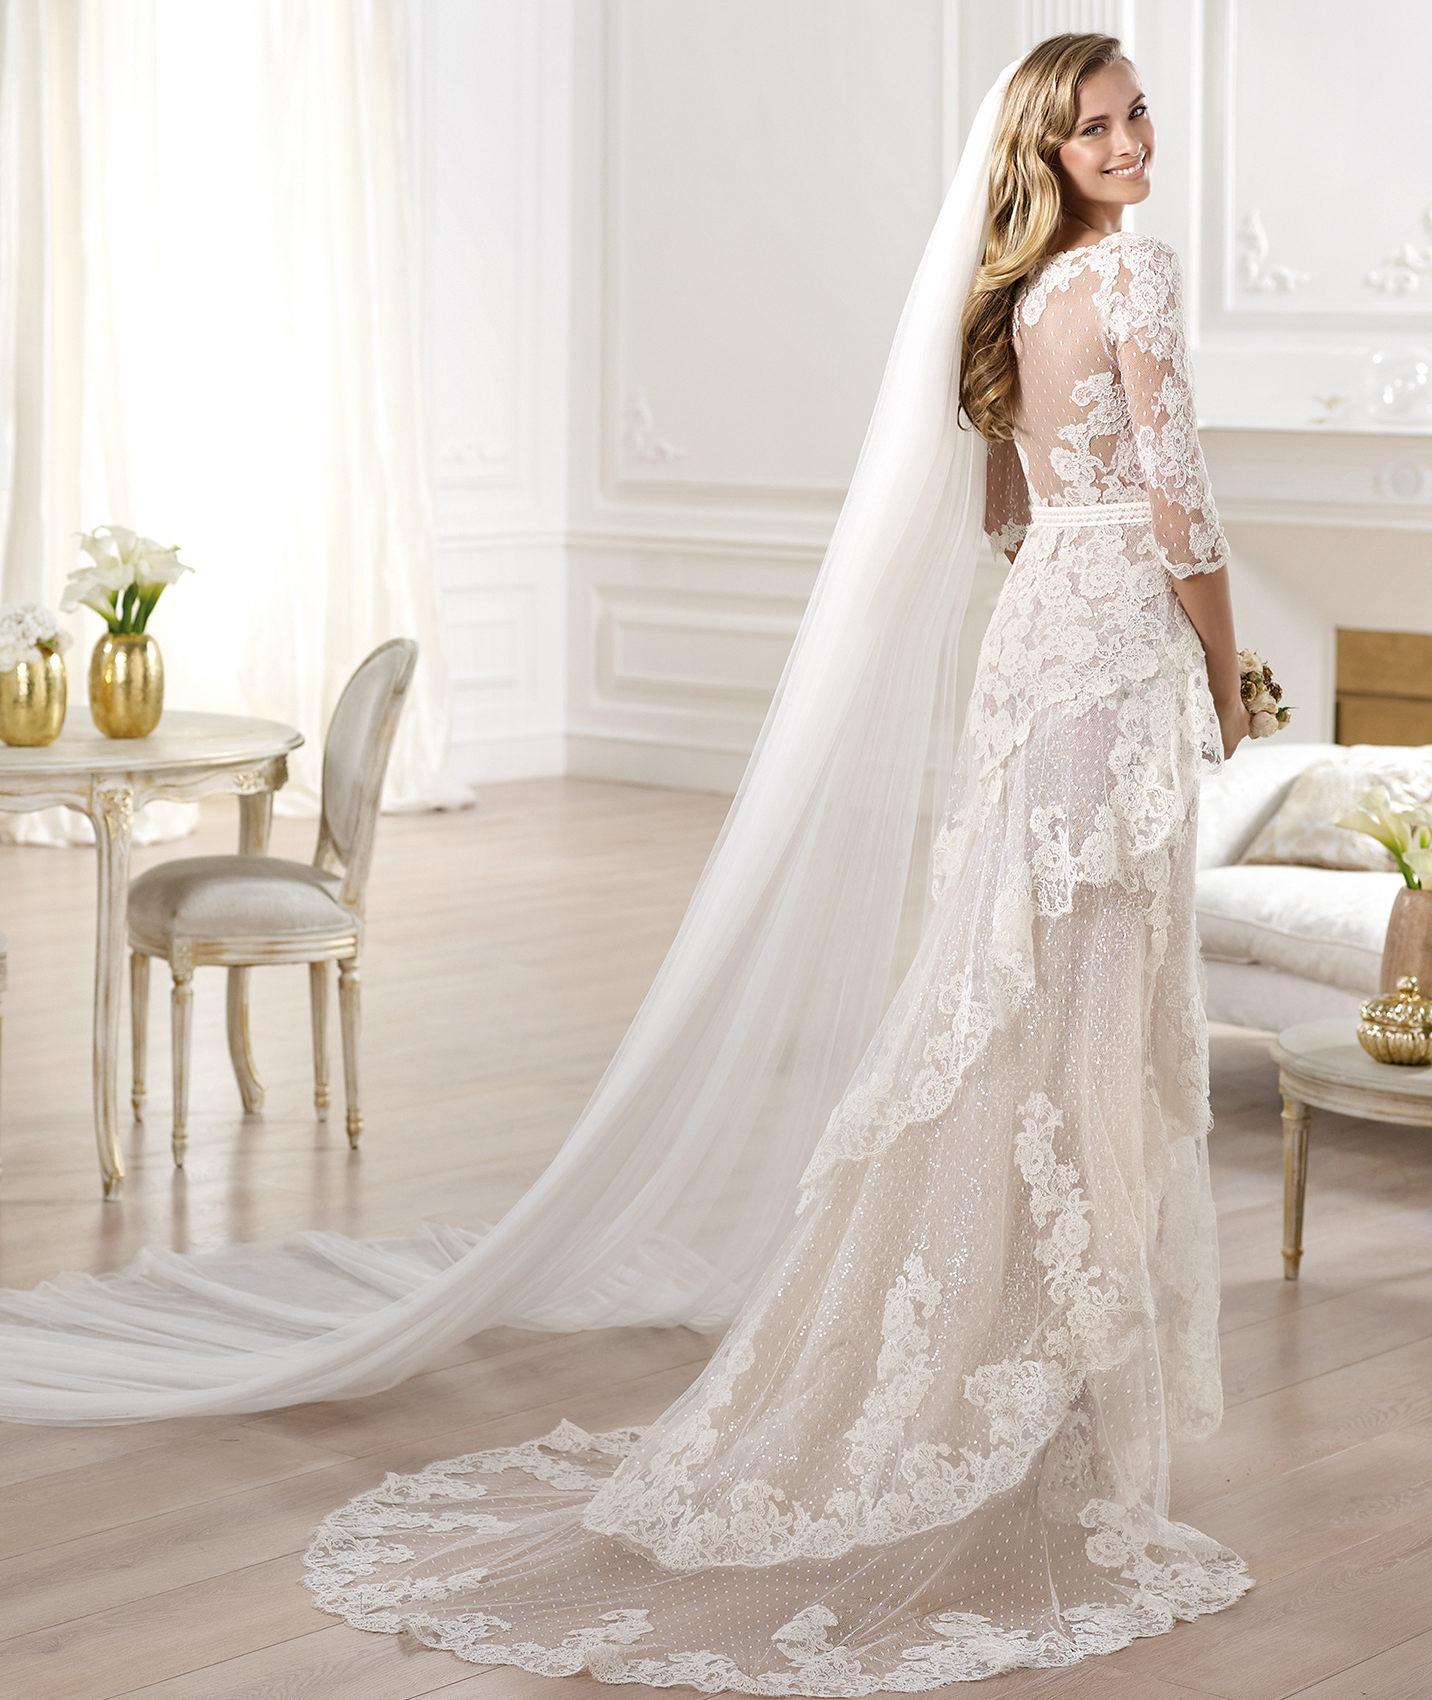 How Much Are Pronovias Wedding Dresses 22